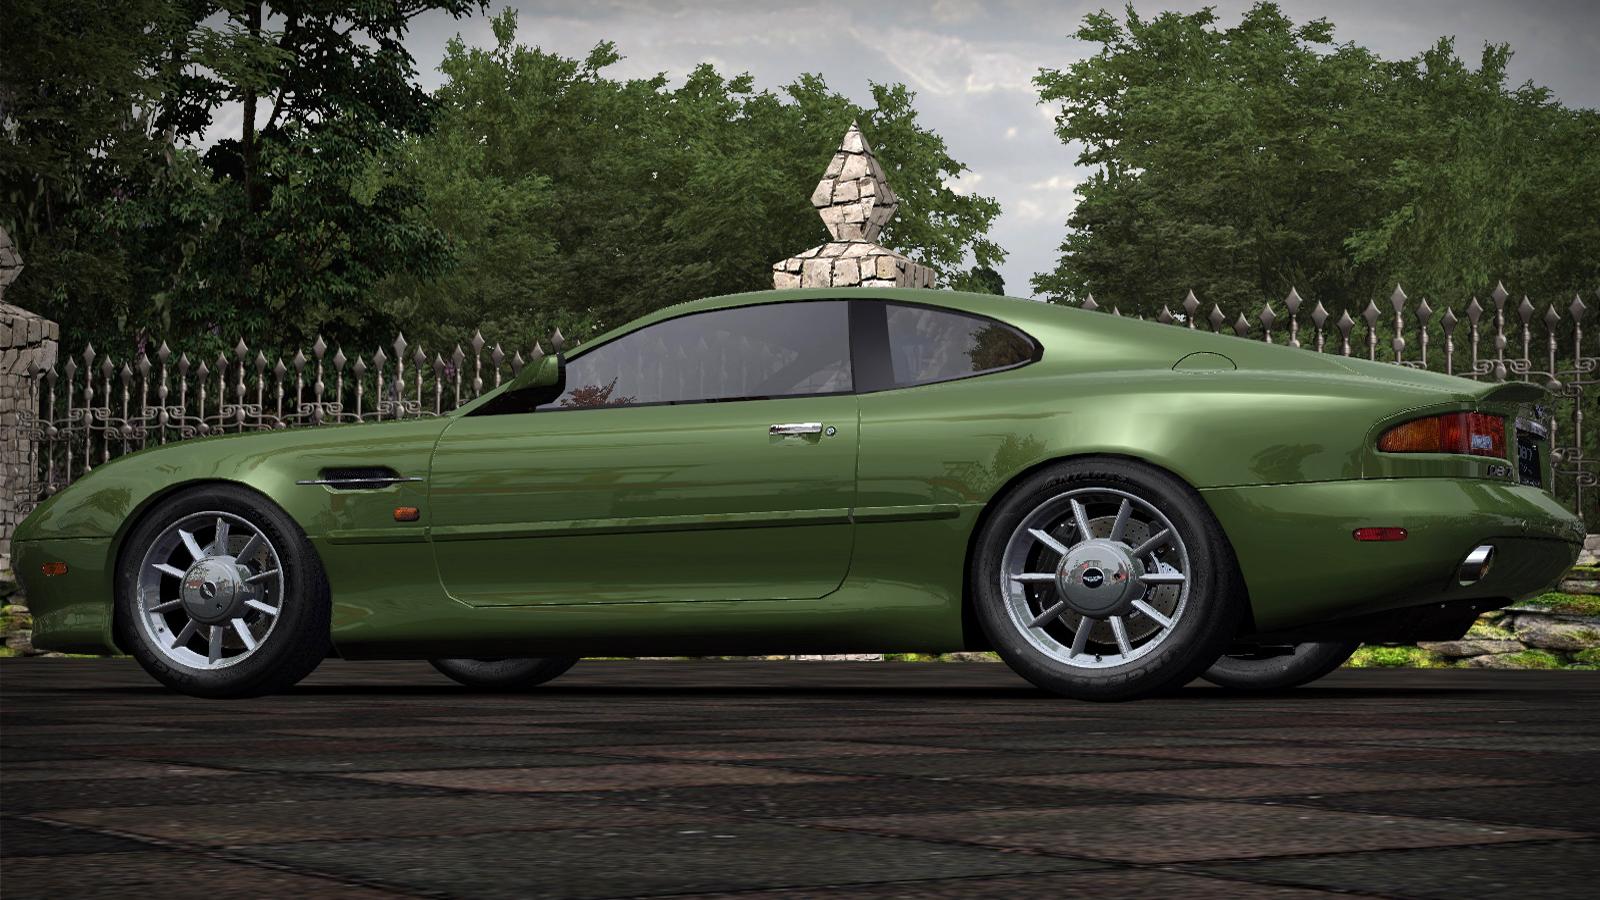 Speed 2020-01-05 19-03-00-949.jpg - Need for Speed: Most Wanted (2005) Aston Martin DB7 Vantage, Автомобиль